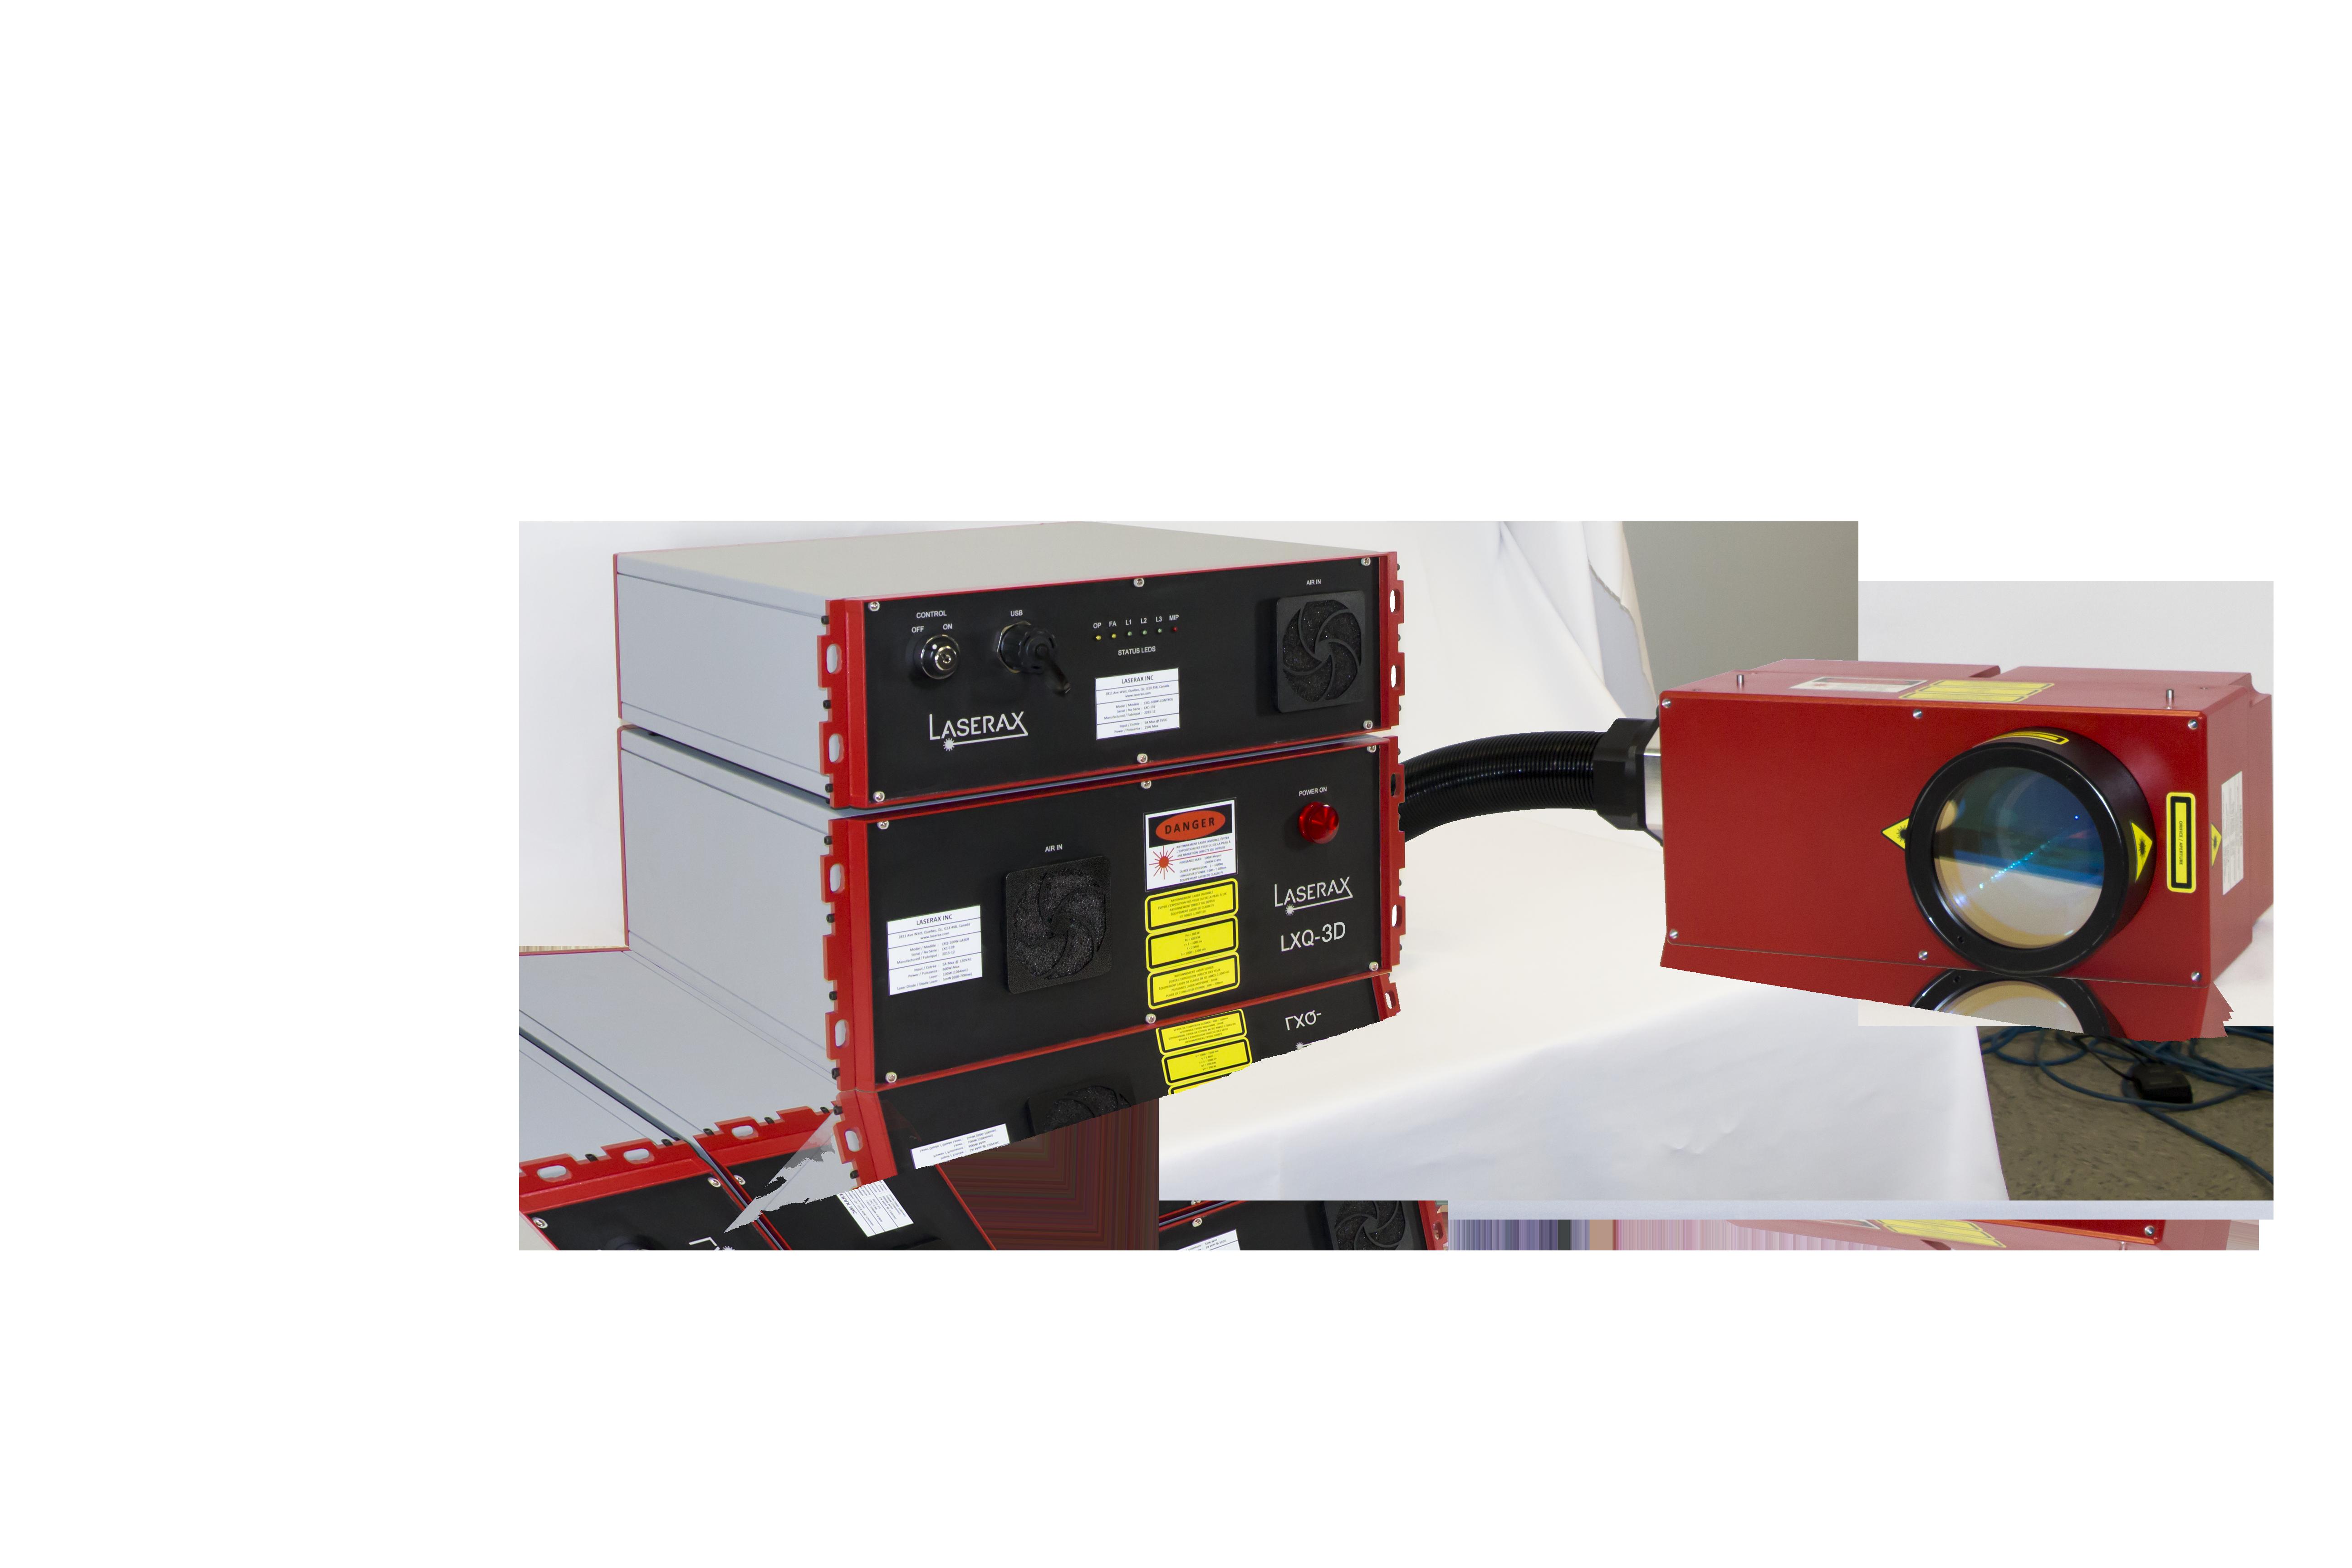 Laserax Industrial Laser Marker - LXQ 3D